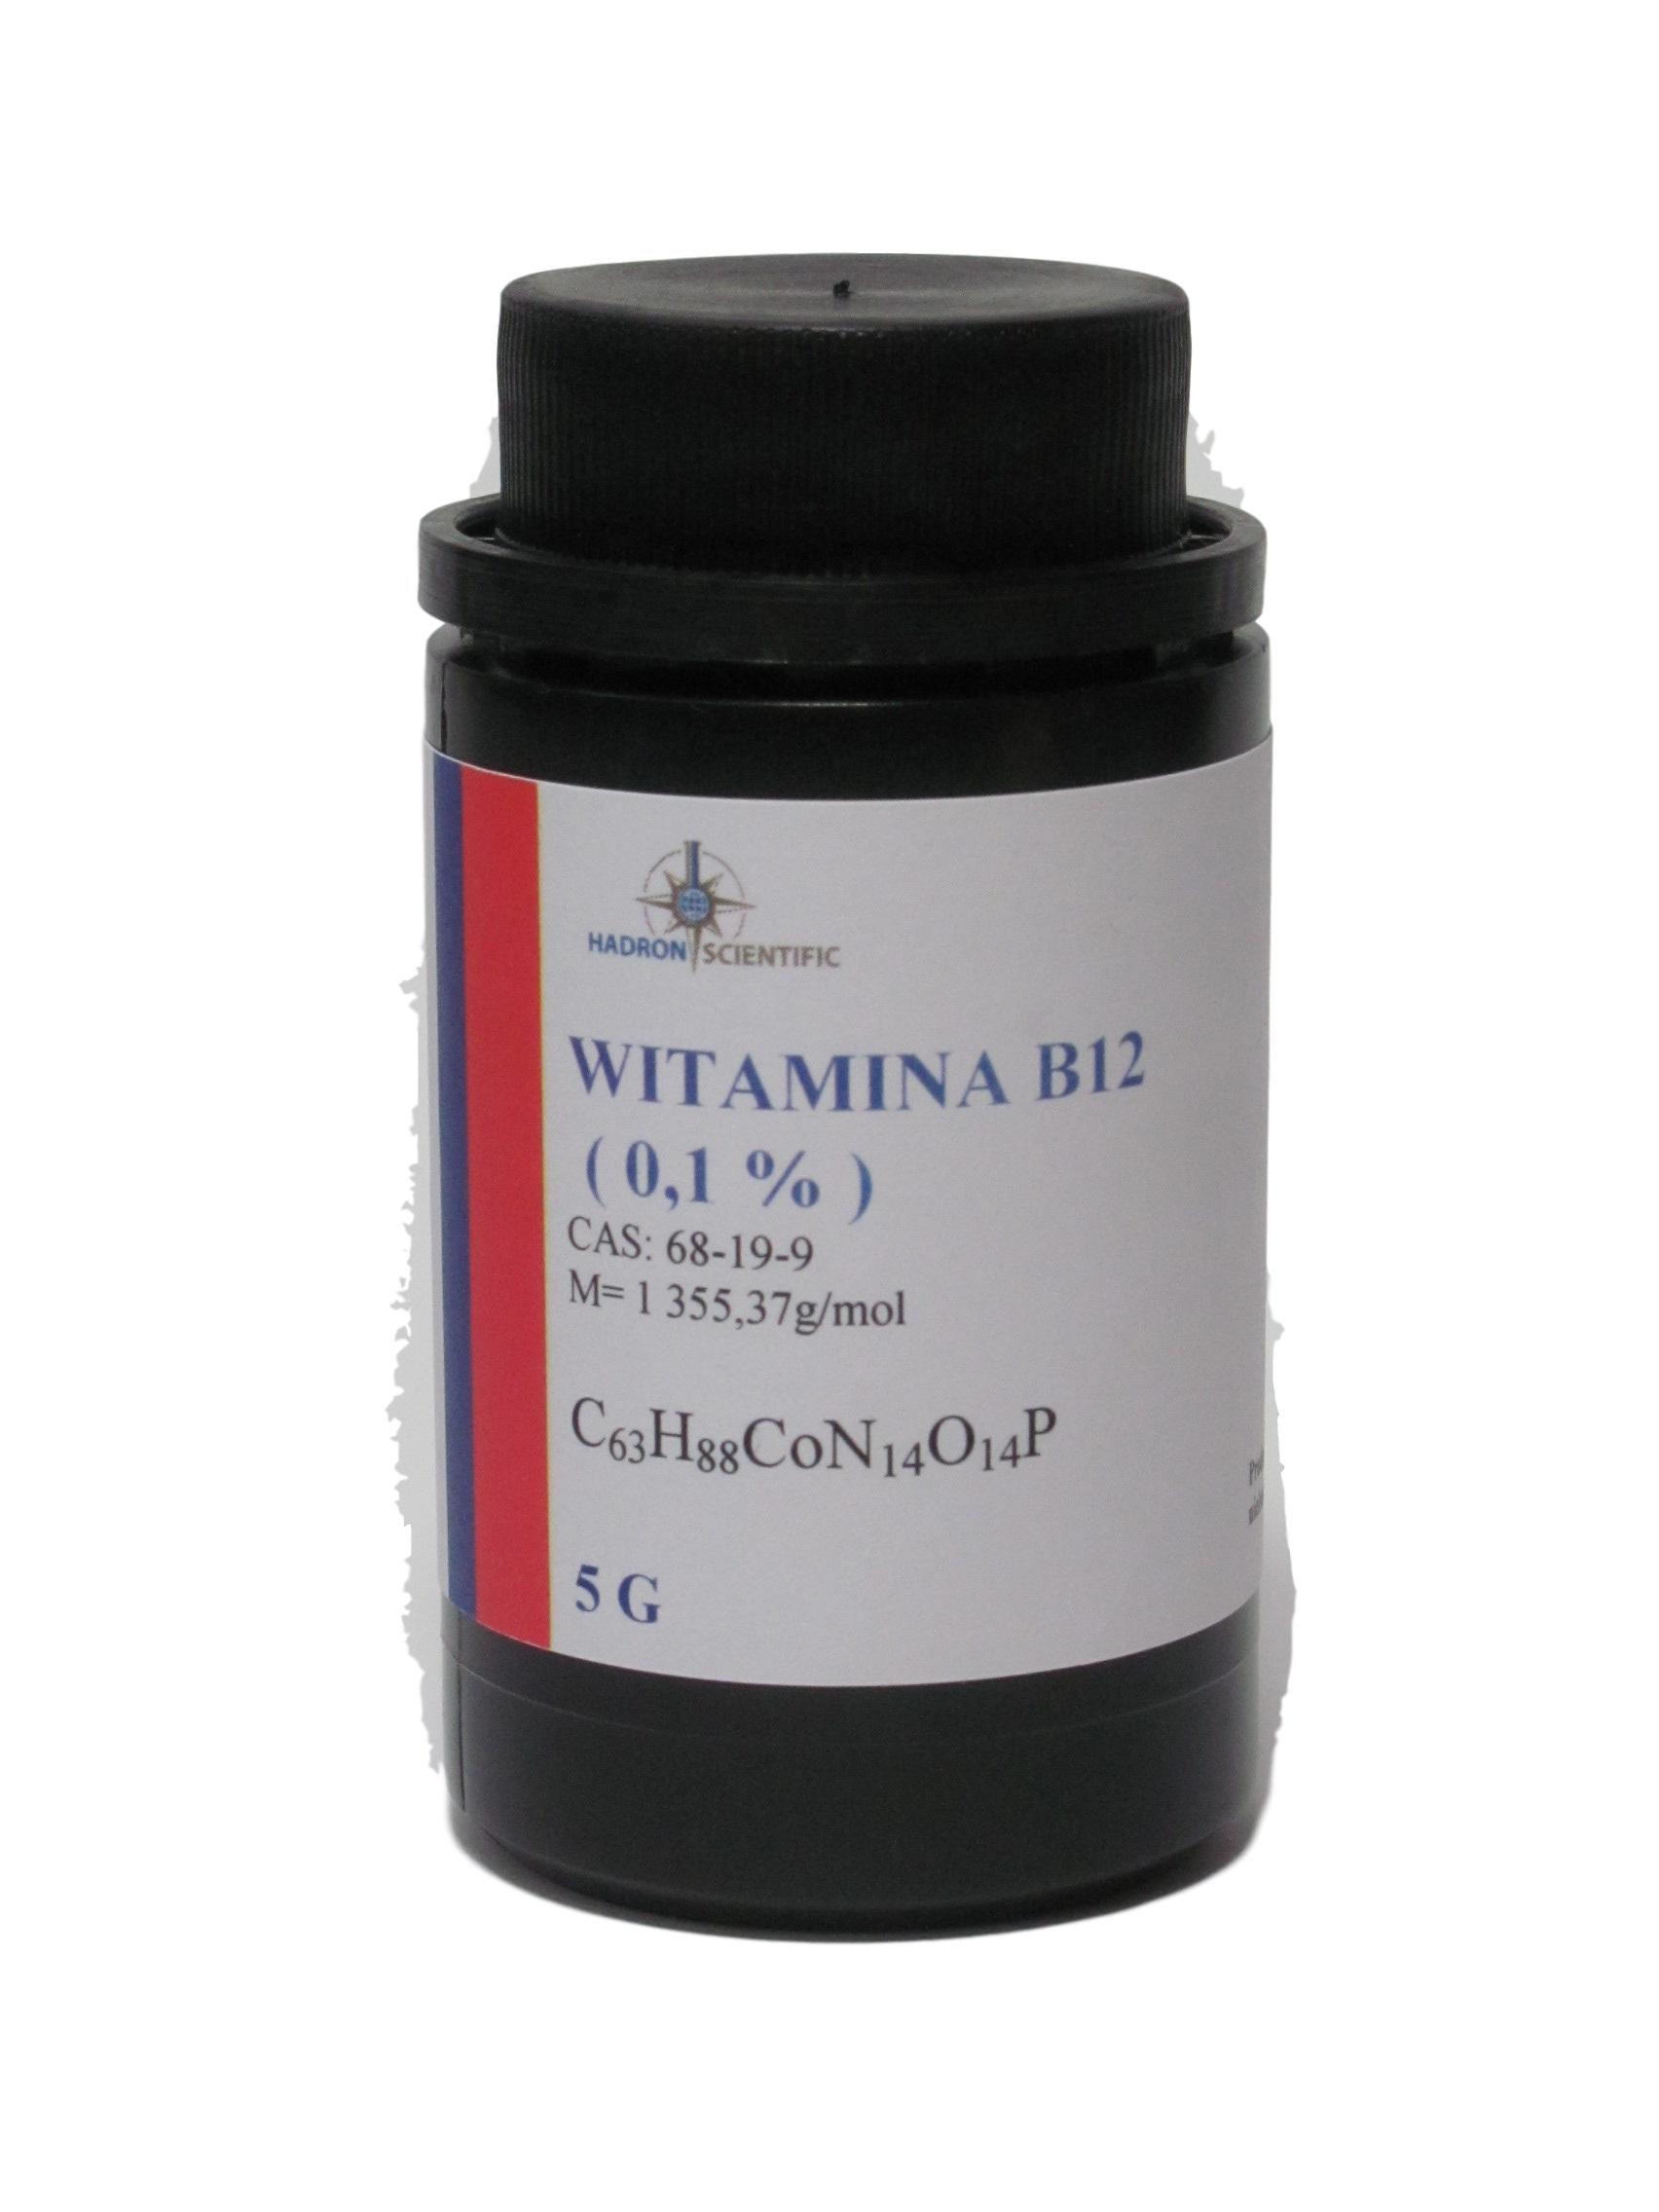 WITAMINA B12 ( CYJANOKOBALAMINA ) 0,1% - 5G